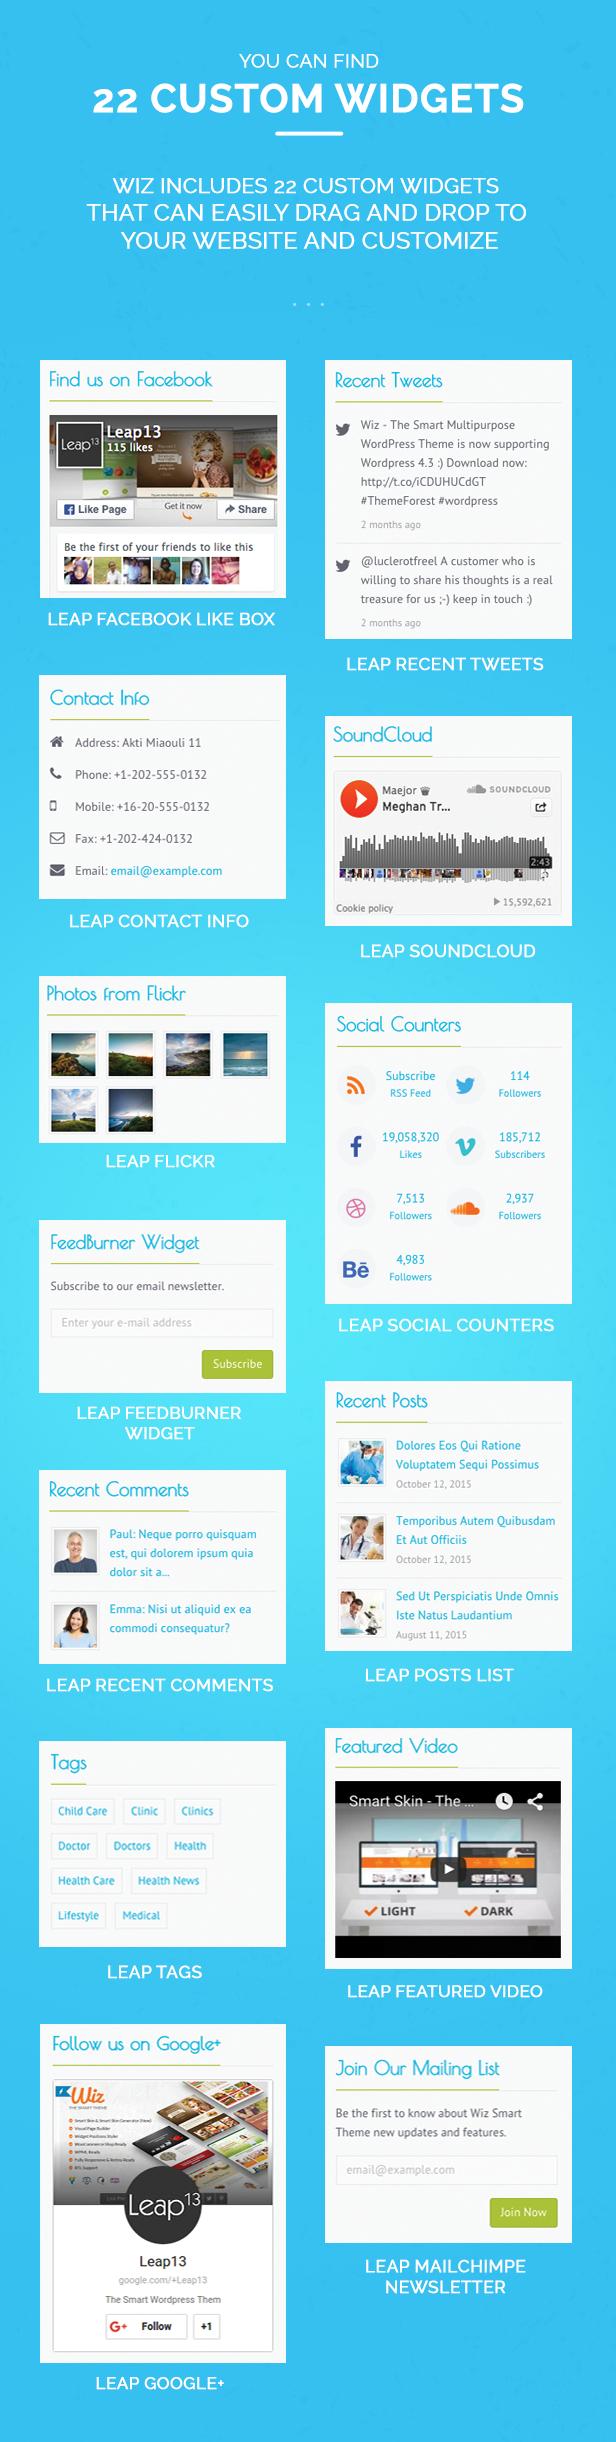 Wiz - The Smart Multi-Purpose WordPress Theme - 17